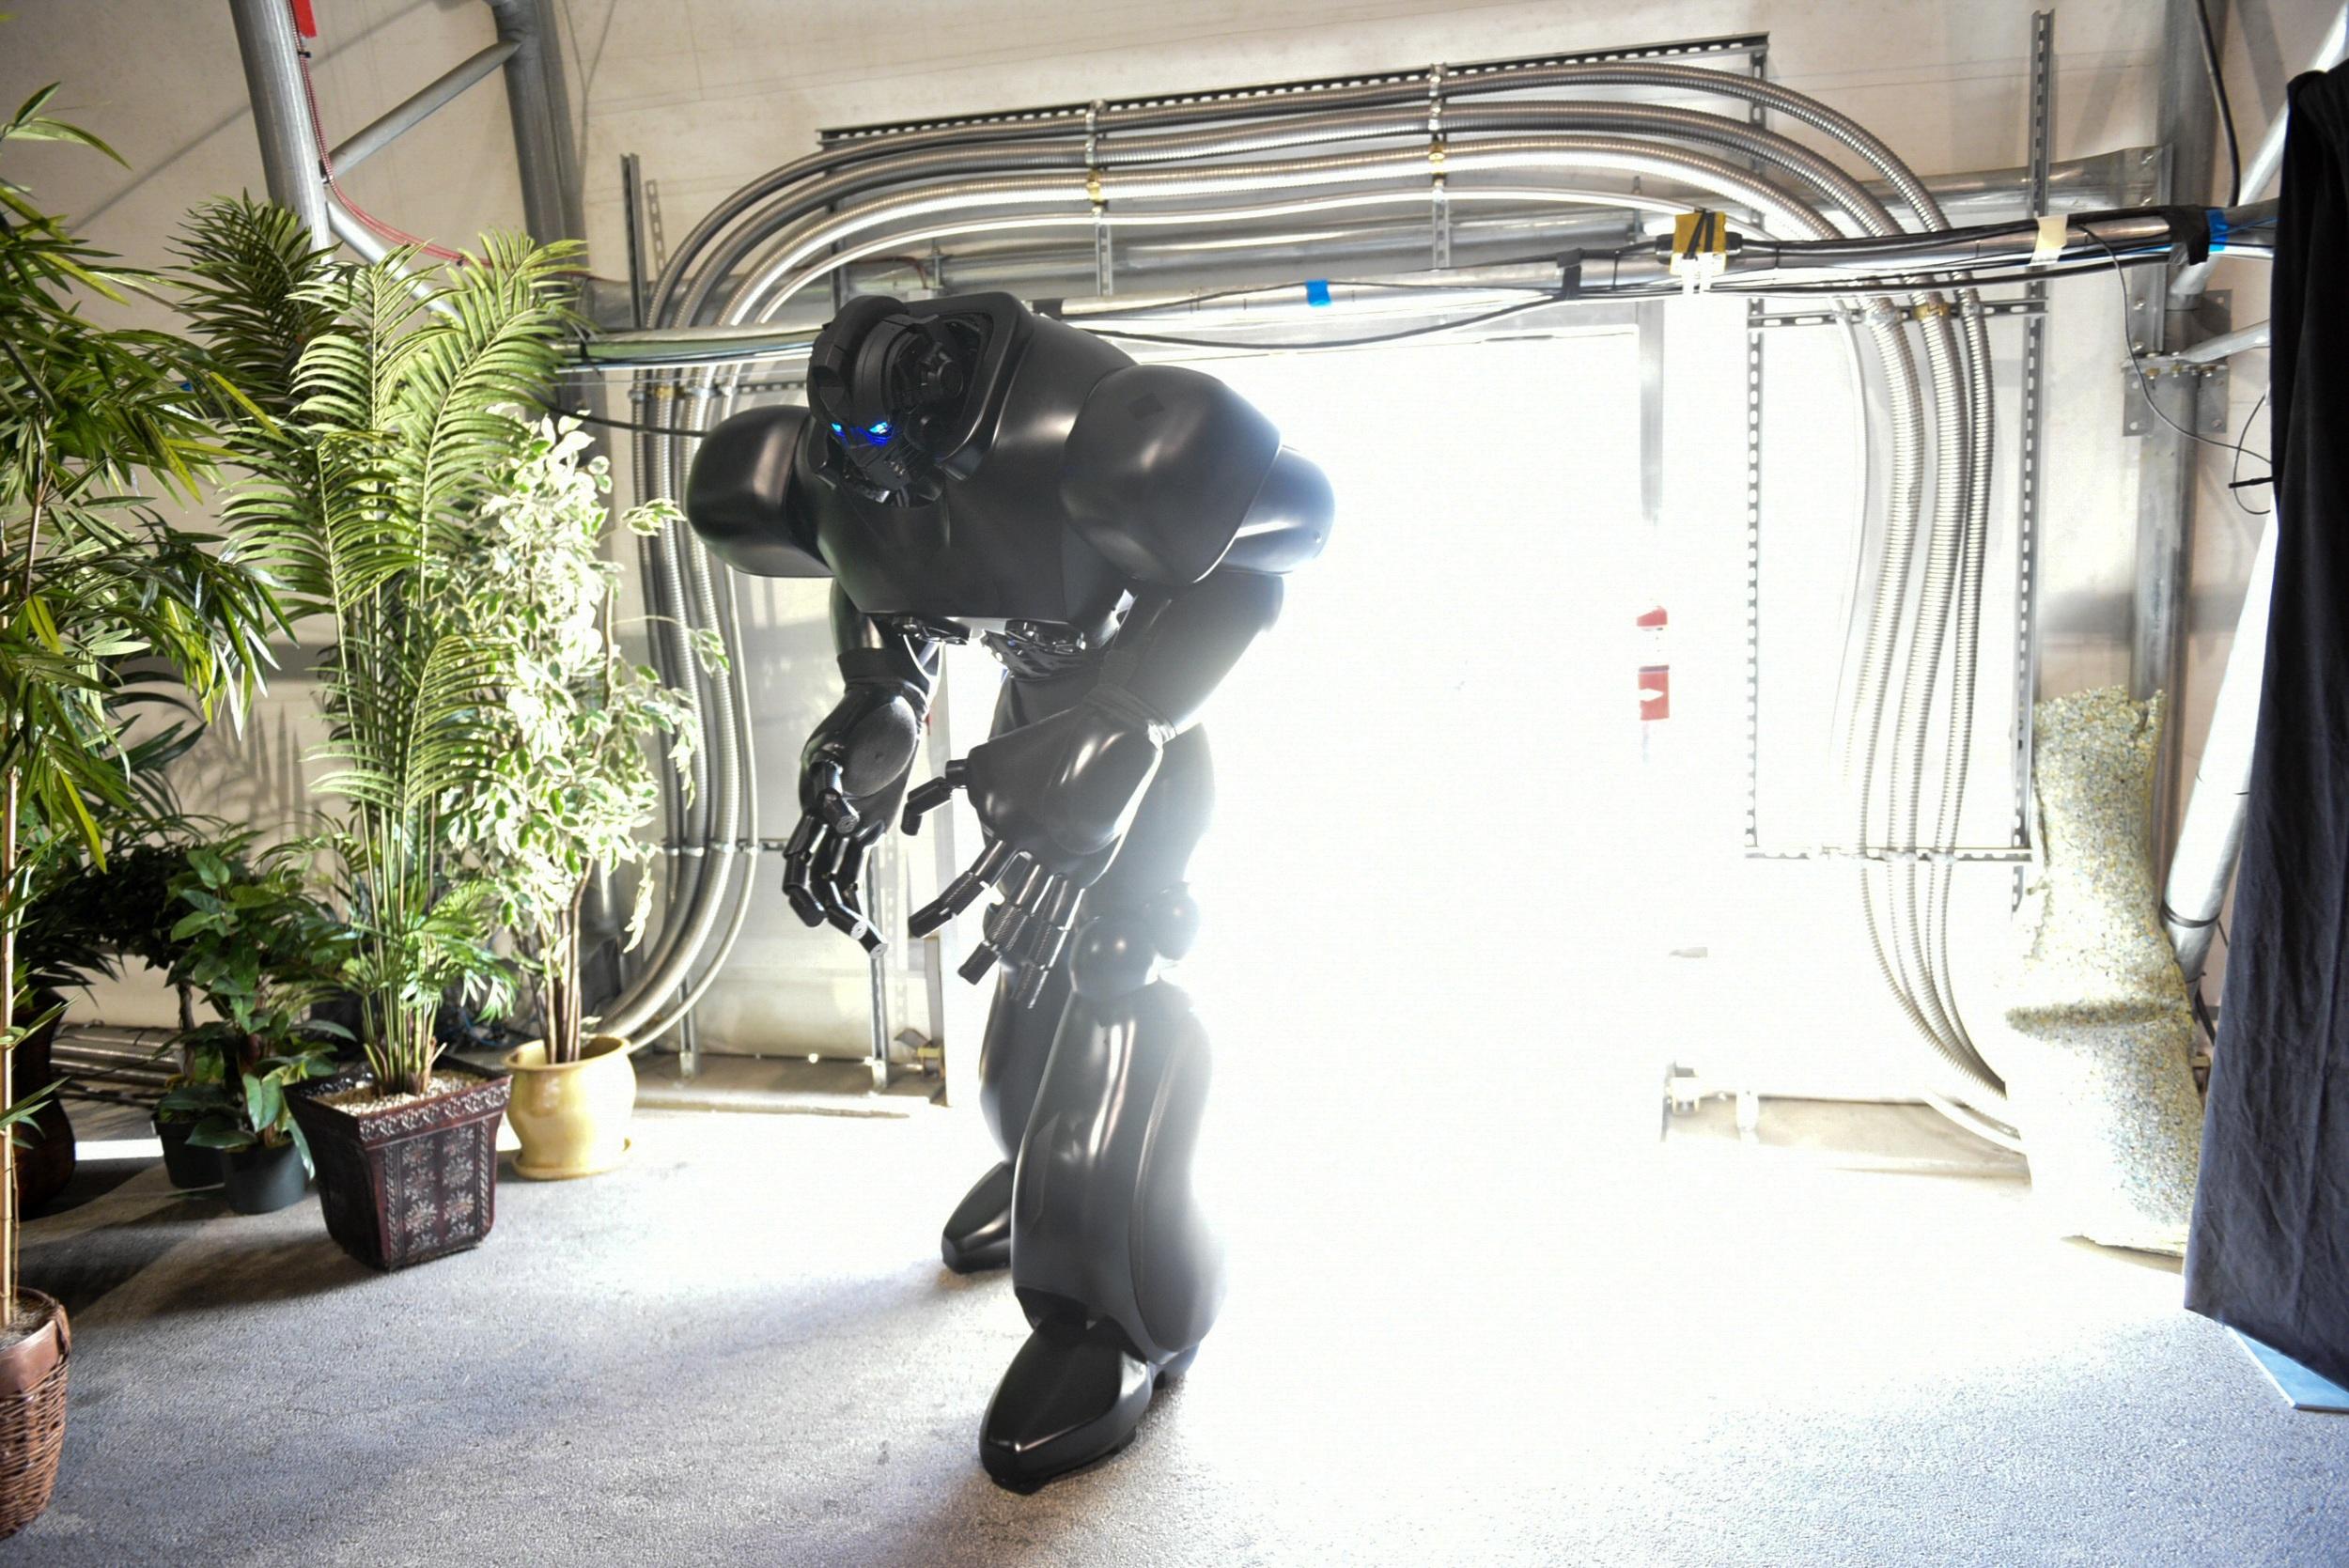 A robot enters through the pavilion door.